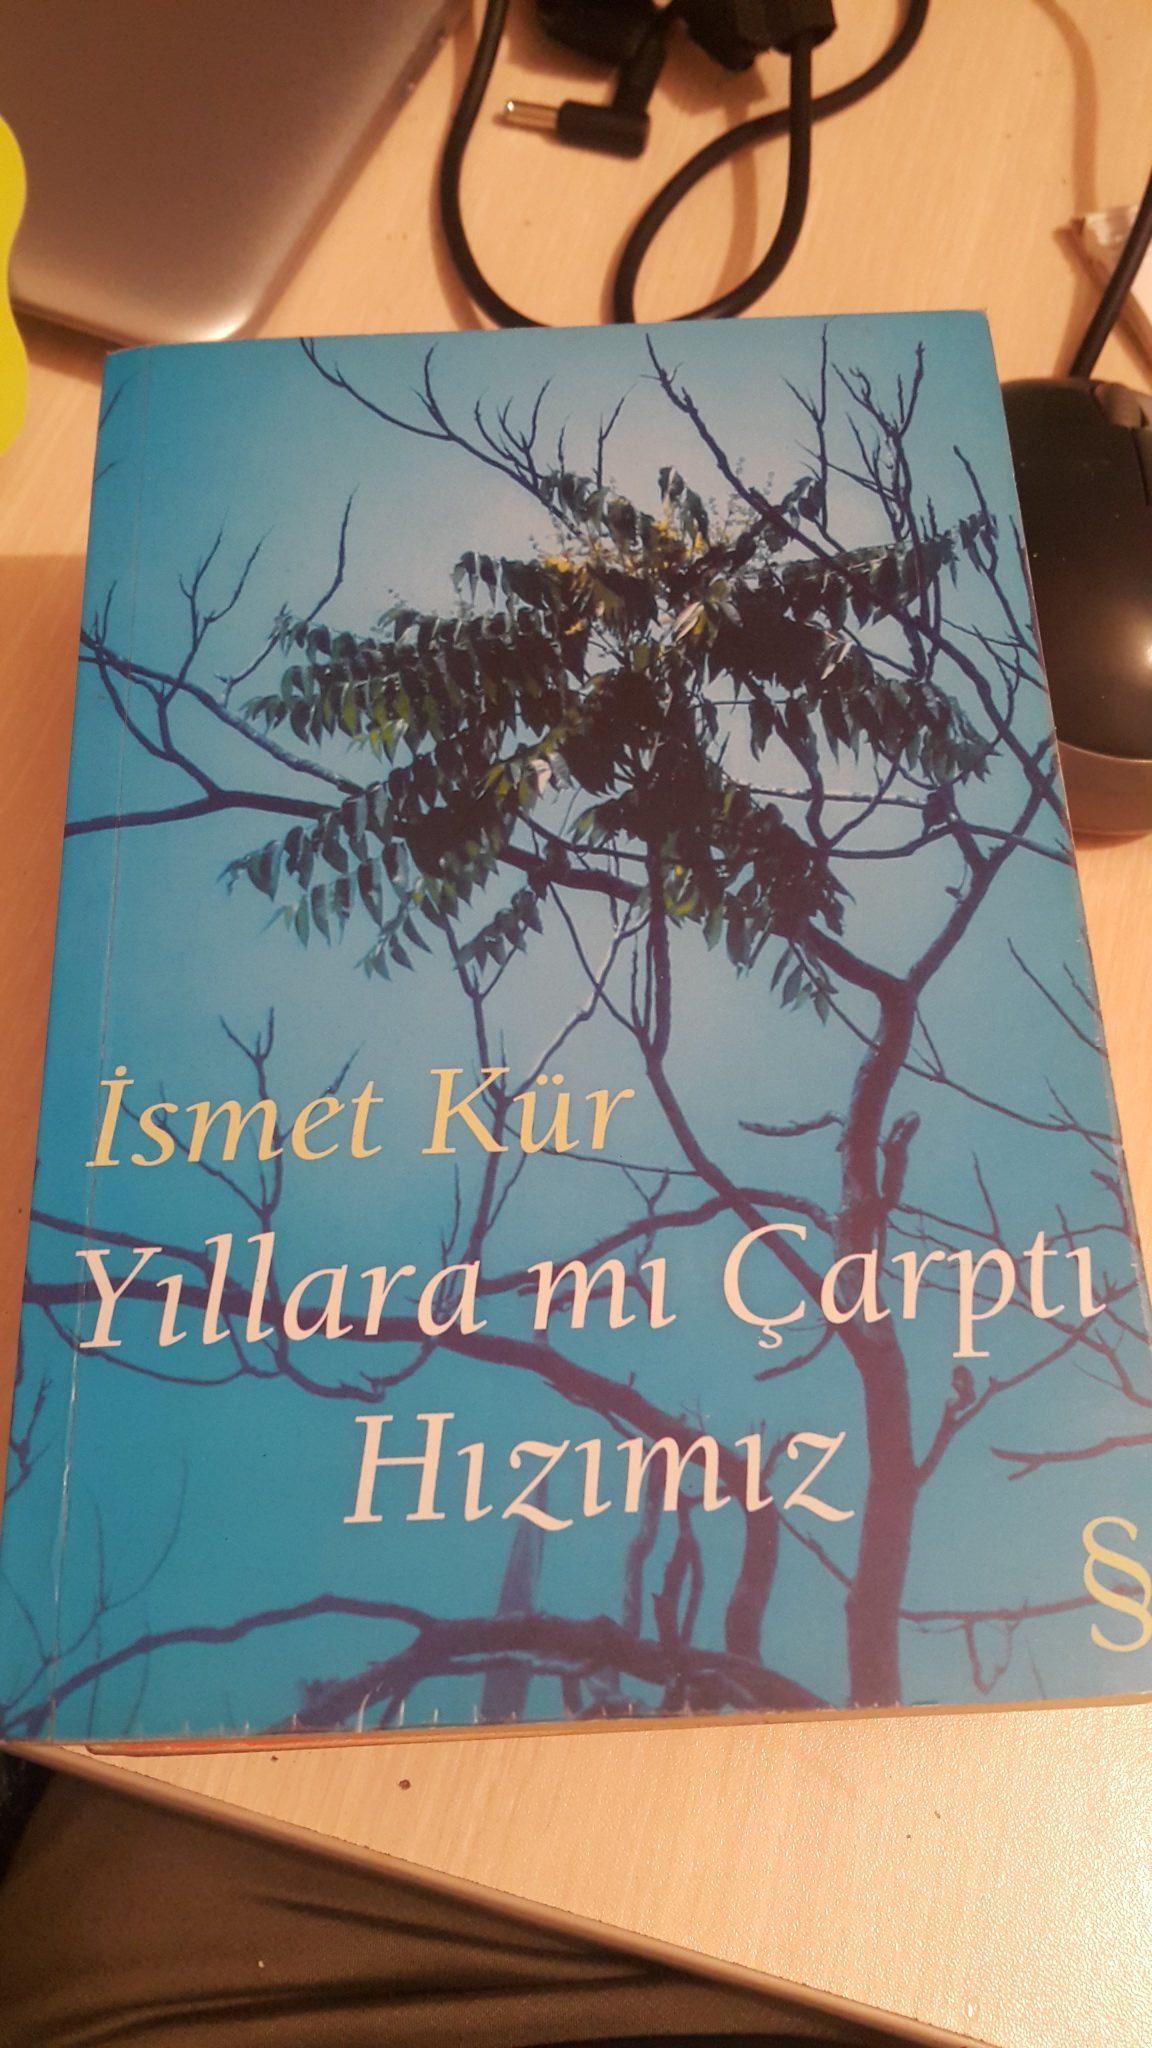 YILLARA MI ÇARPTI HIZIMIZ /İSMET KÜR